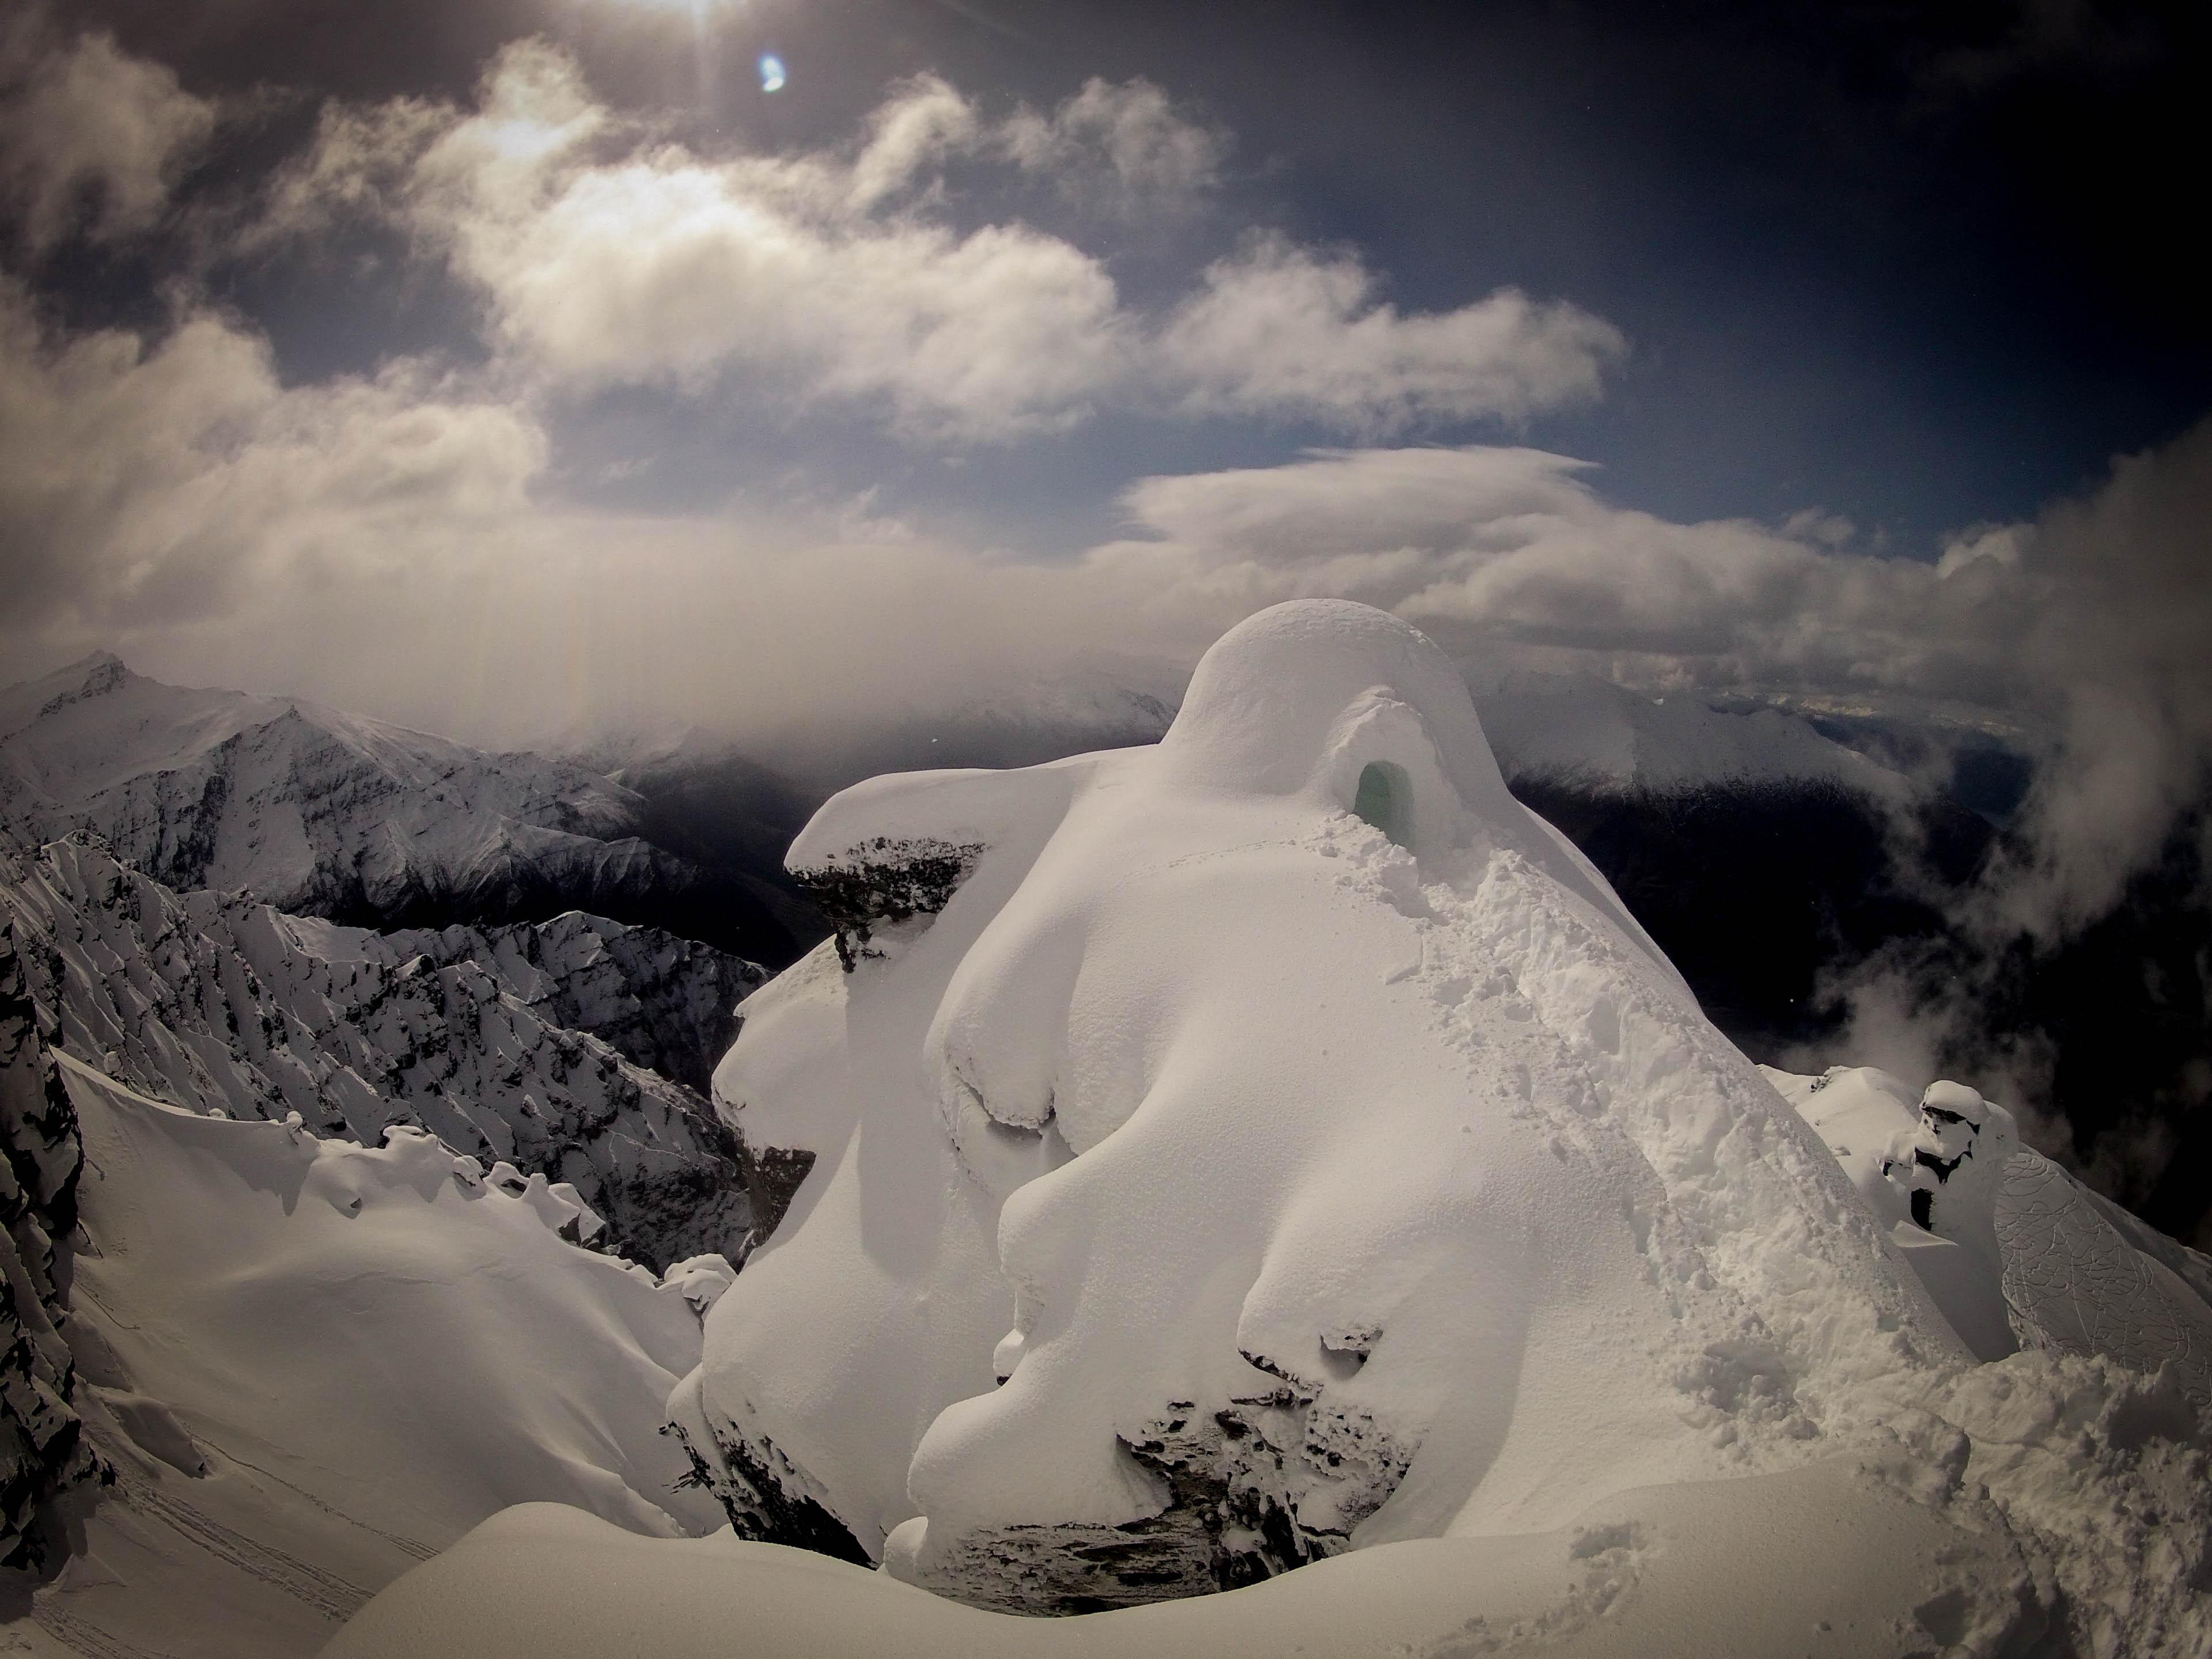 Igloo Over Mount Aspiring, Treble Cone